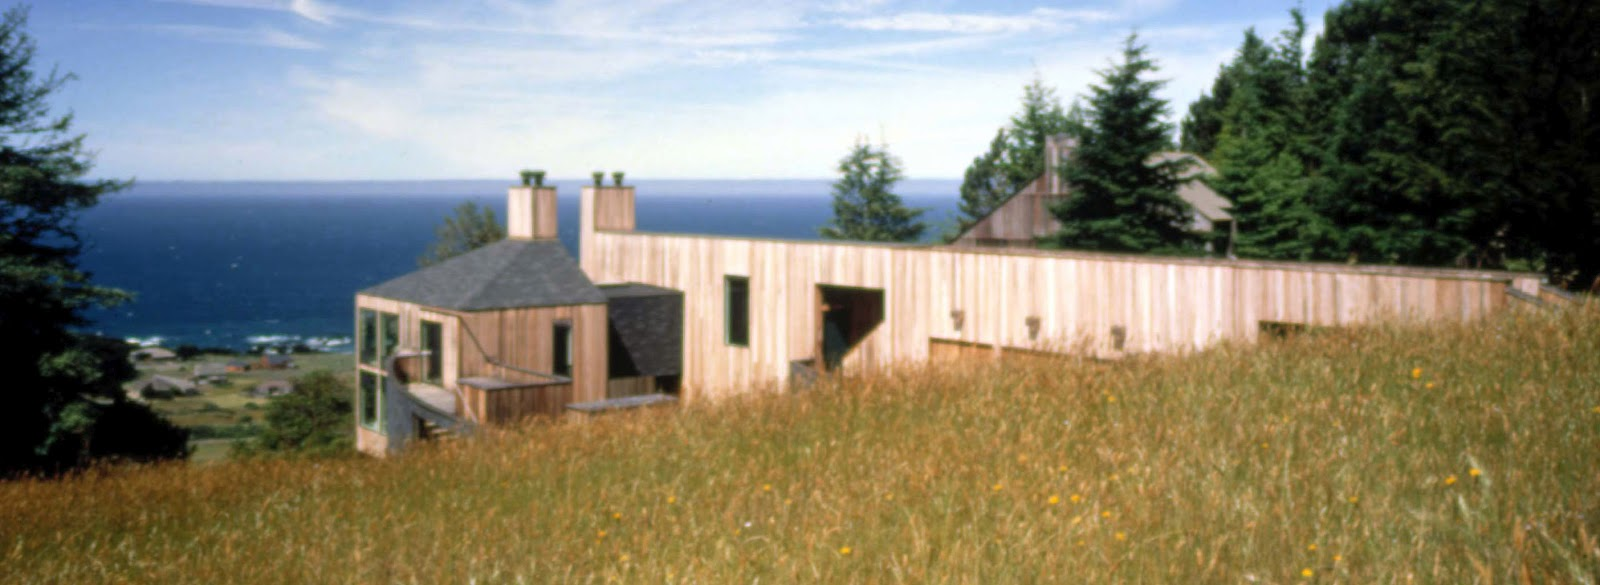 OBIE BOWMAN ARCHITECT FAIA MY JOURNAL: Design With ...